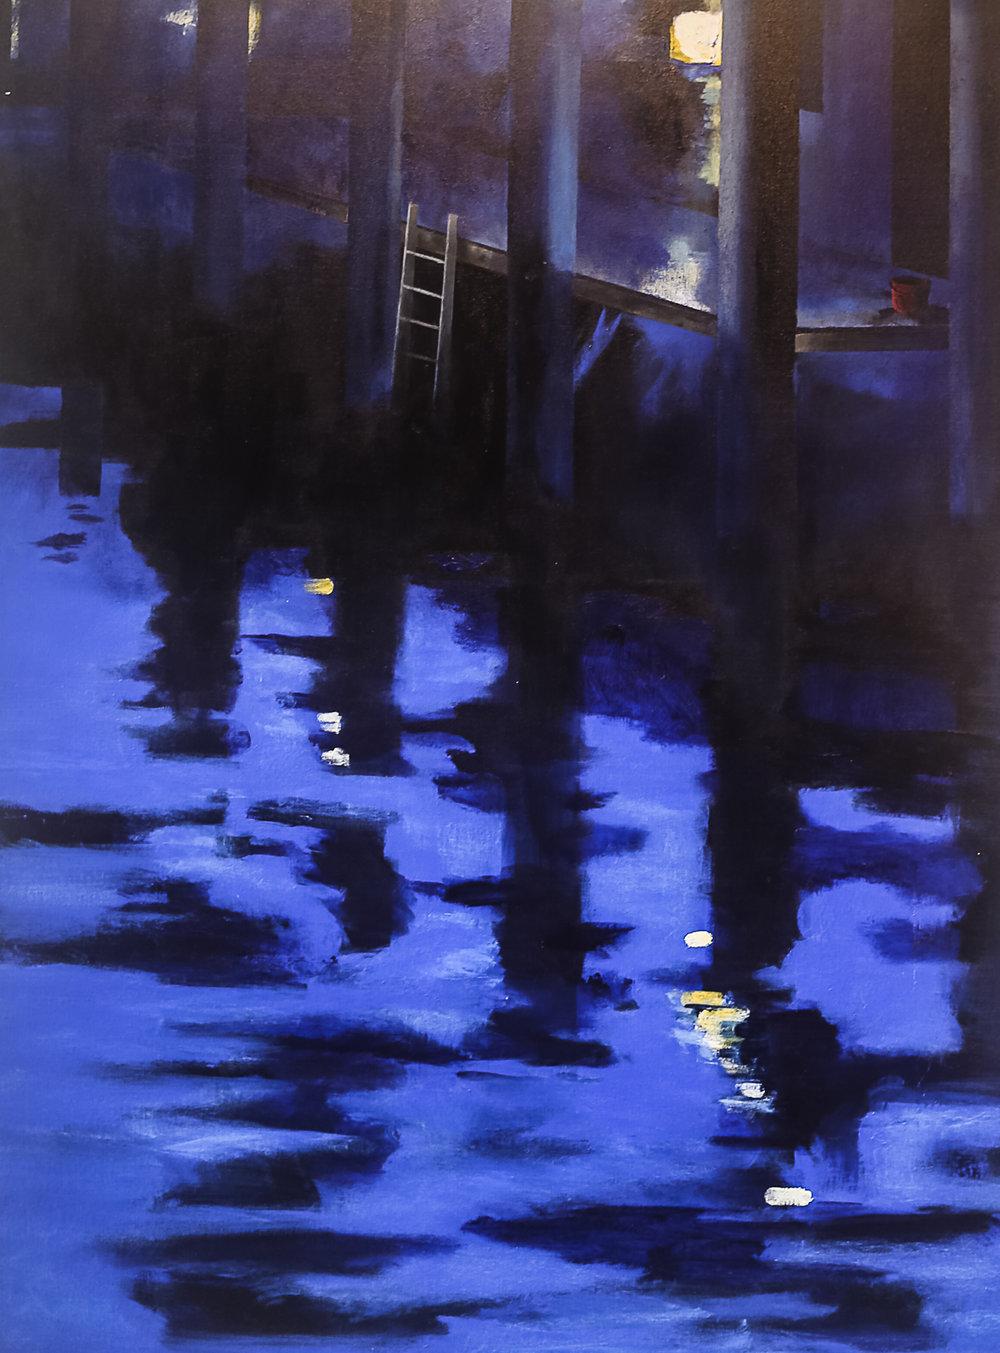 blue dock scene